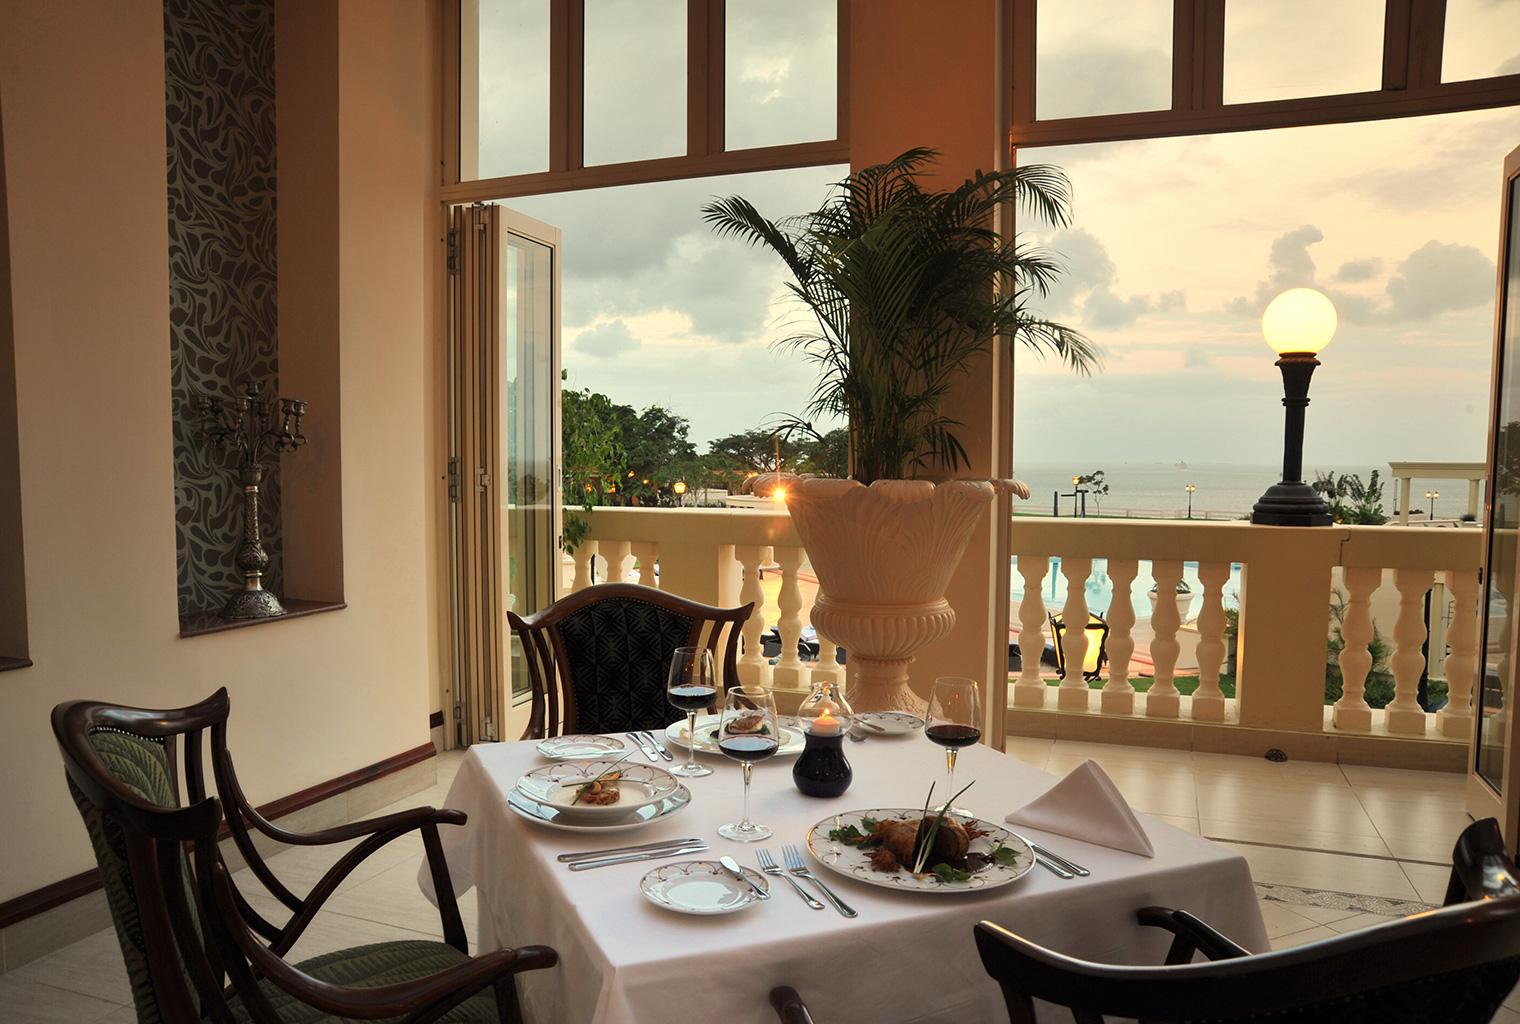 Polana-Serena-Hotel-Mozambique-Veranda